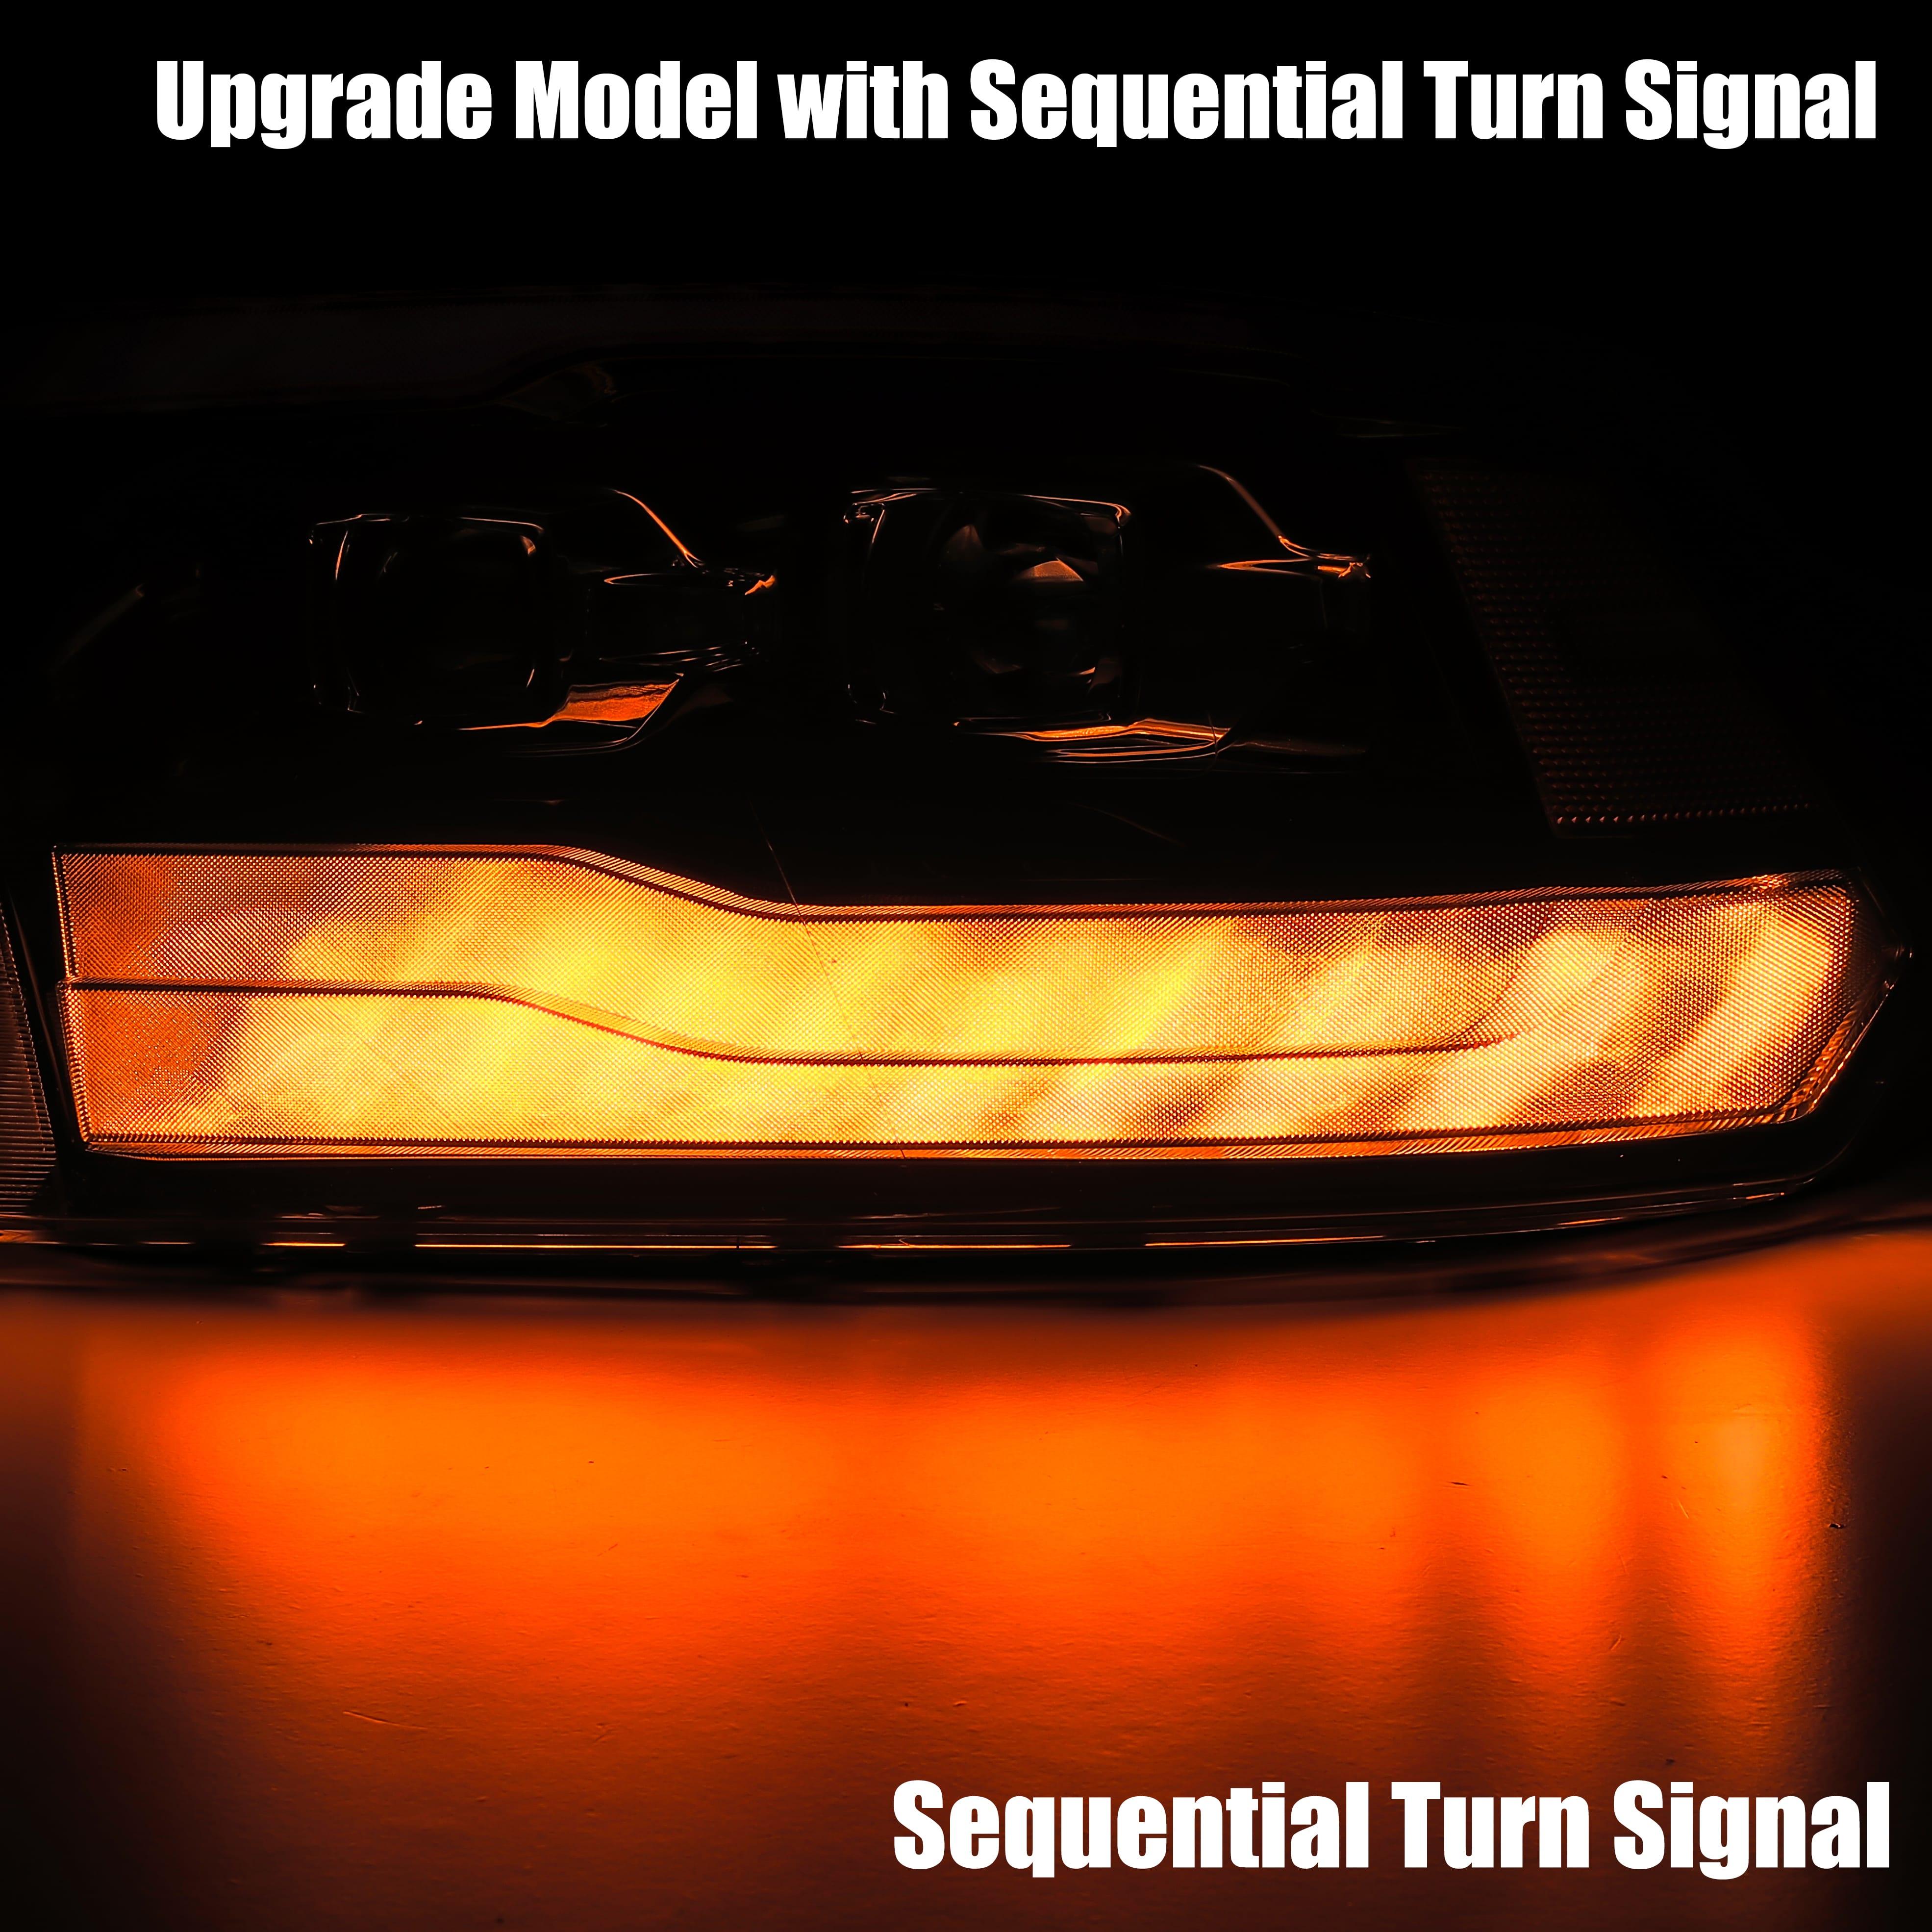 Signal light 2009 2010 2011 2012 2013 2014 2015 2016 2017 2018 Ram Truck 1500/2500/3500 PRO-Series Projector Headlights